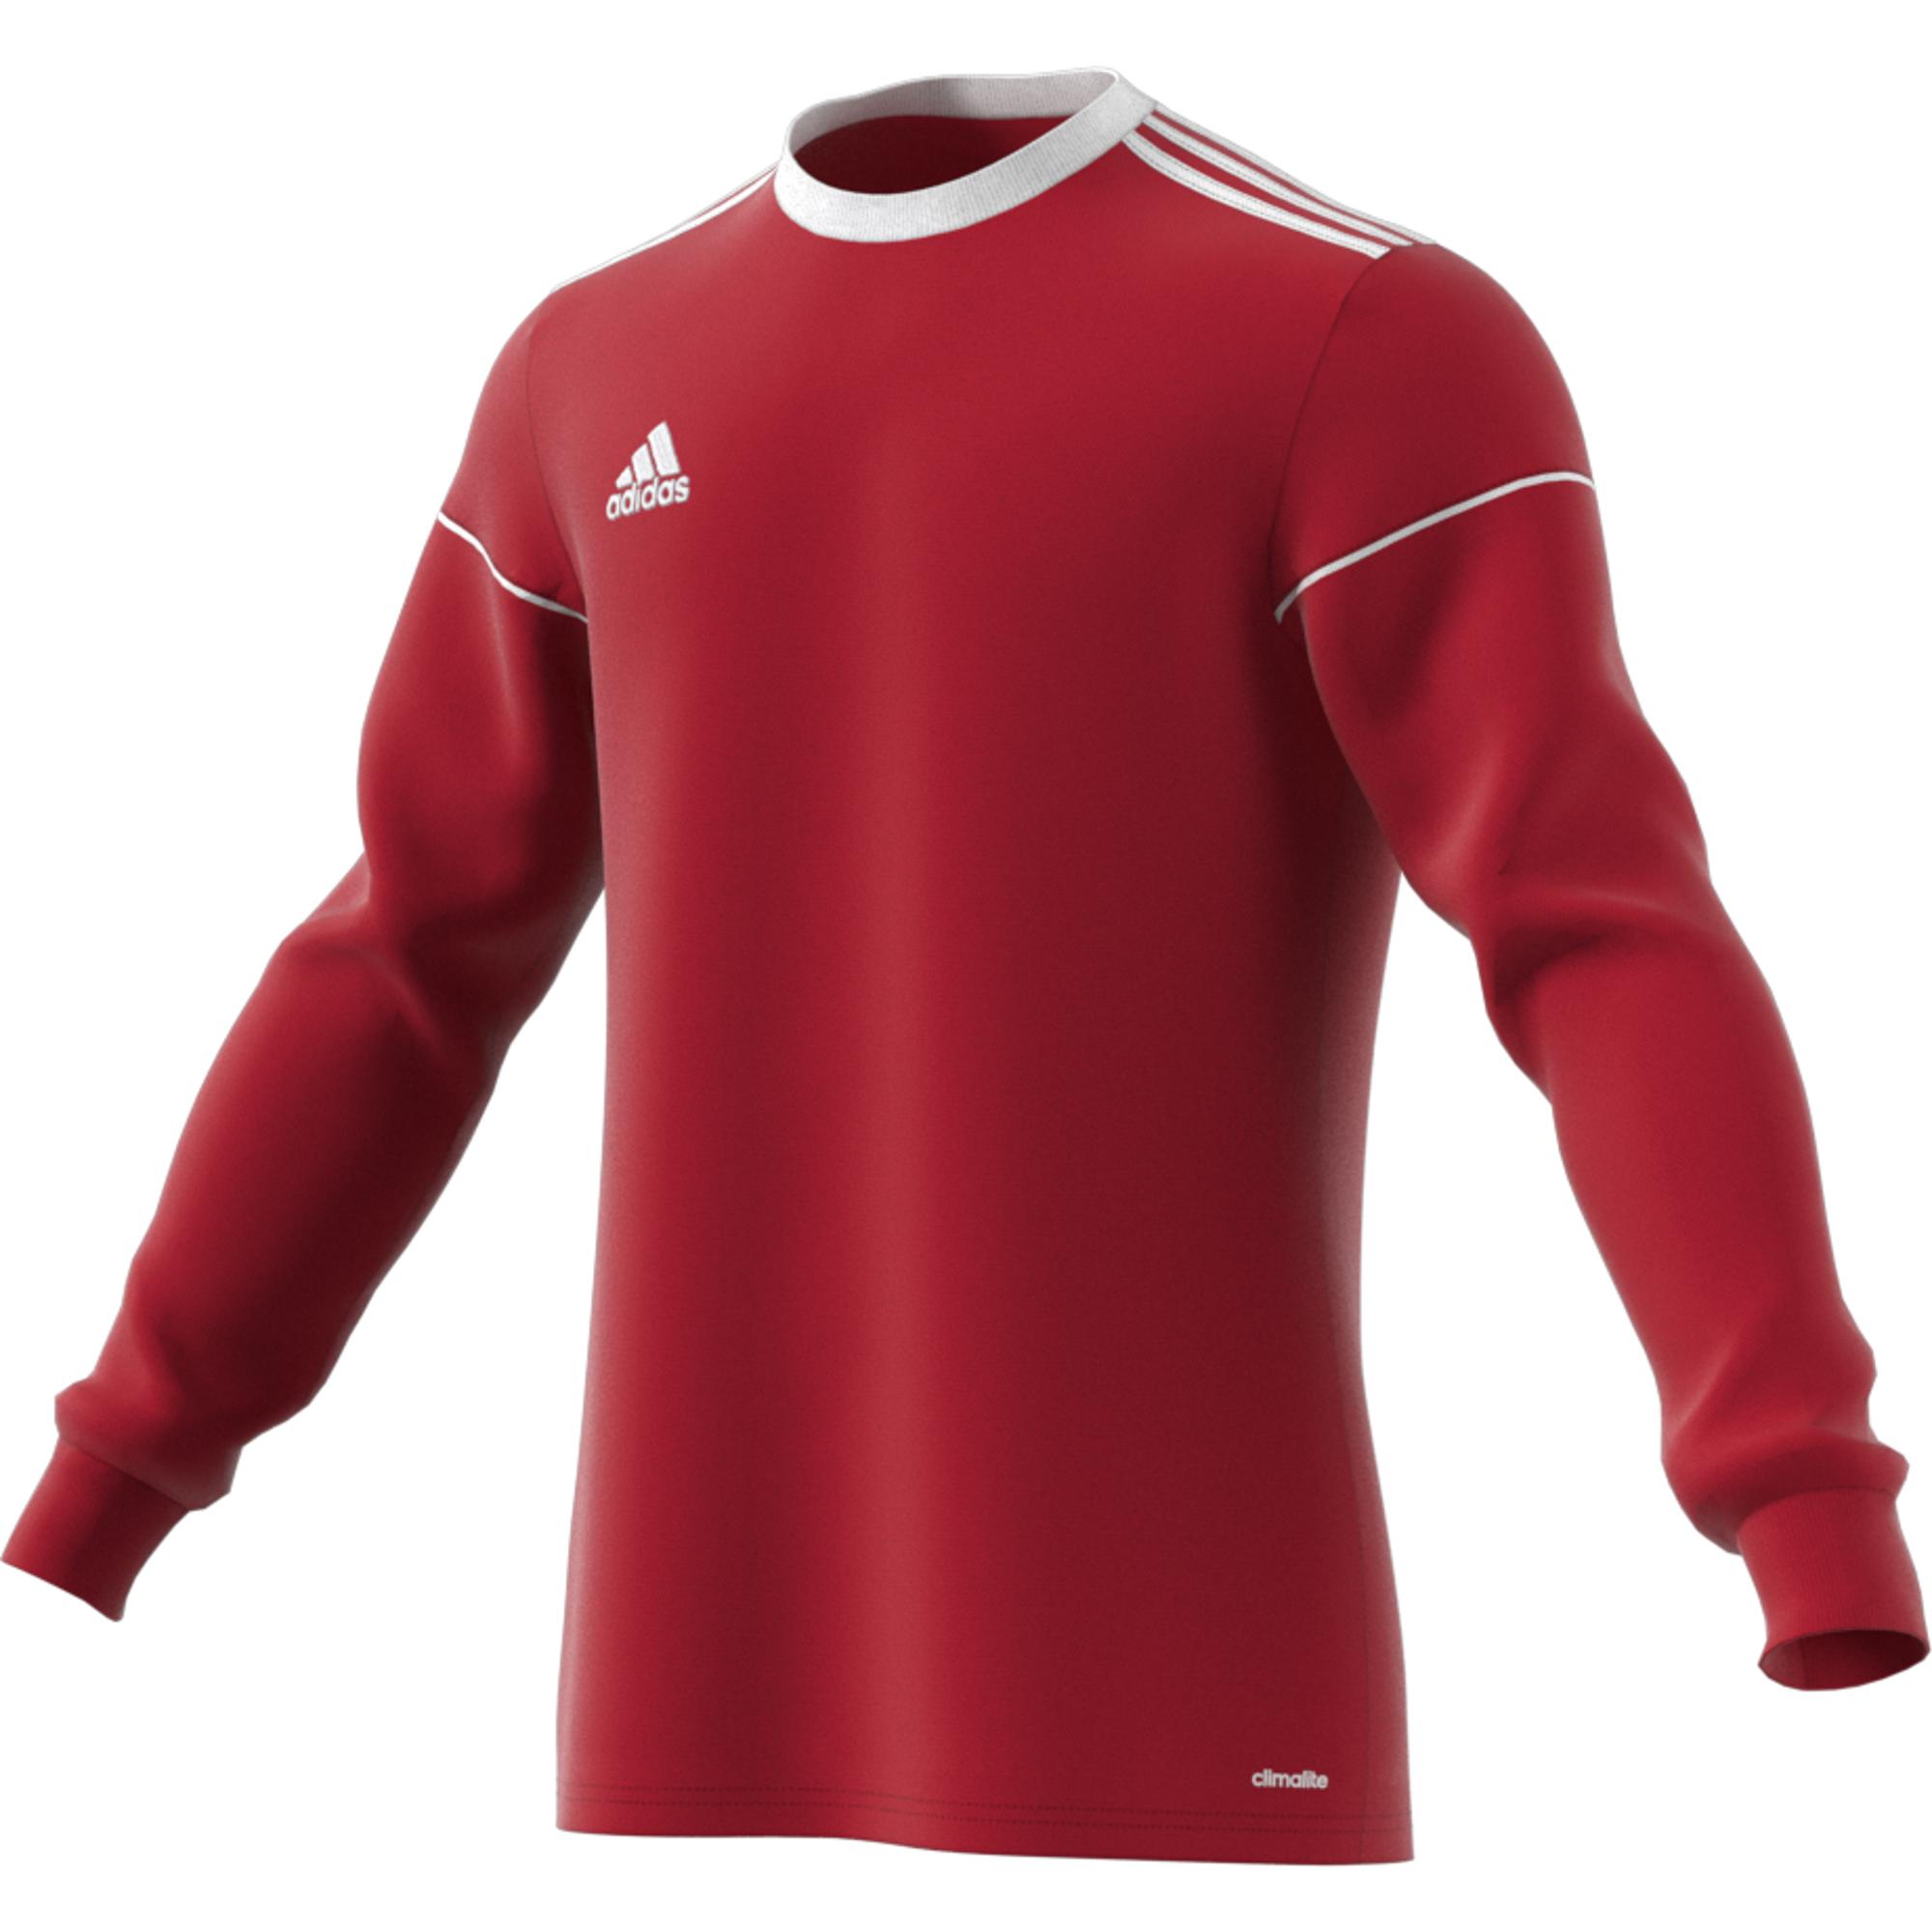 081d8562b28 Adidas Squadra 17 Long Sleeve Football Jersey Youth